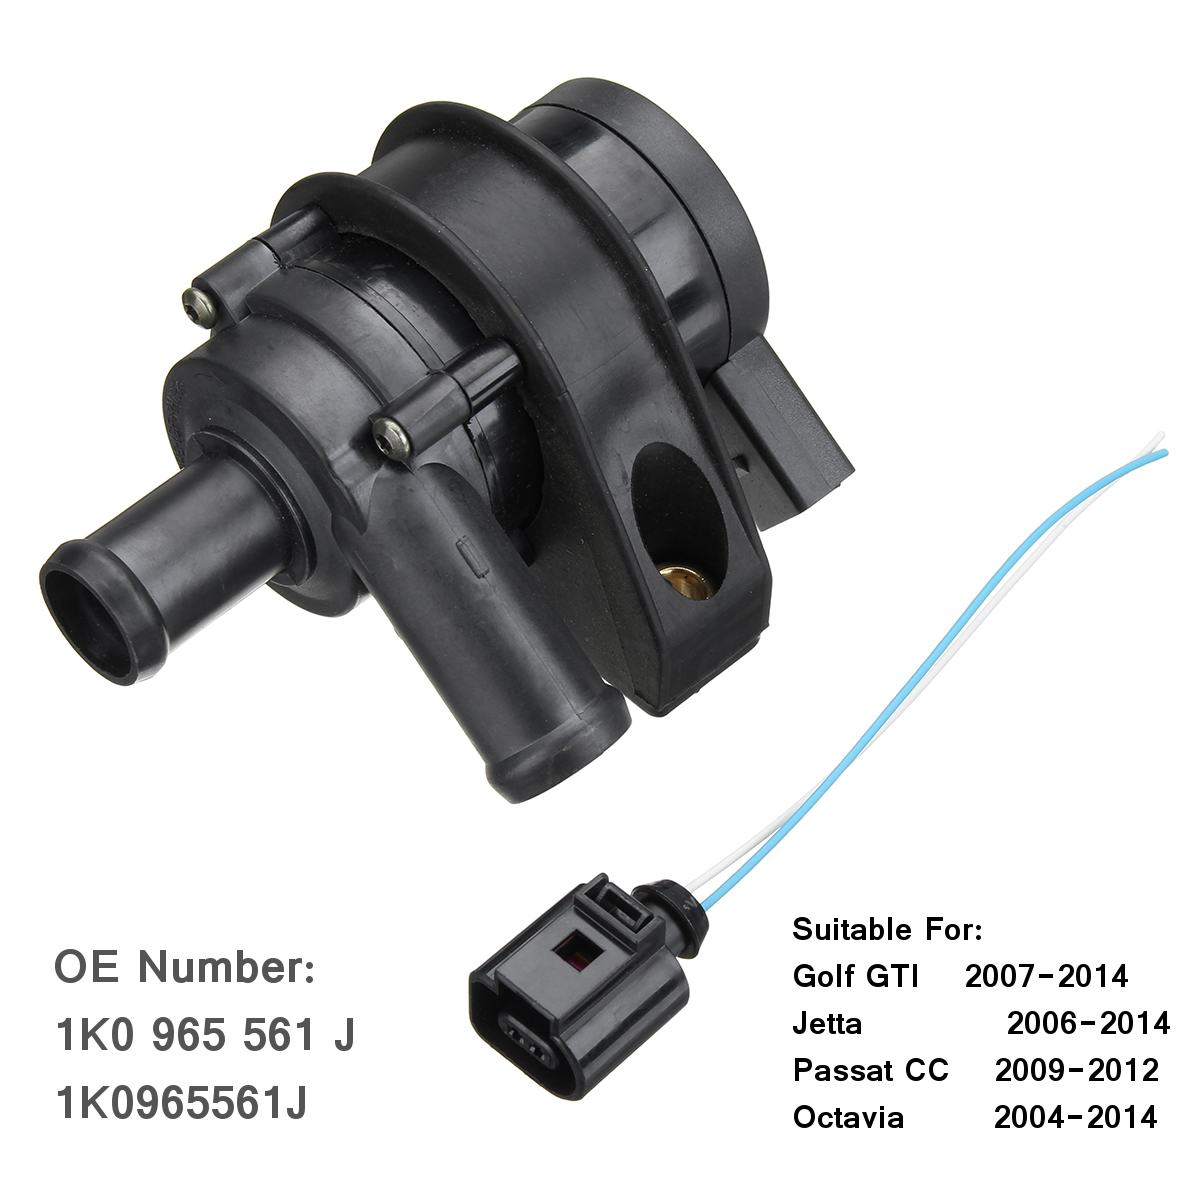 Car Engine Cooling Water Pump Connect Plug Cable 1K0965561J 1K0965561G For VW Jetta Golf GTI Passat CC Octavia 1.8 T 2.0 T 12 V